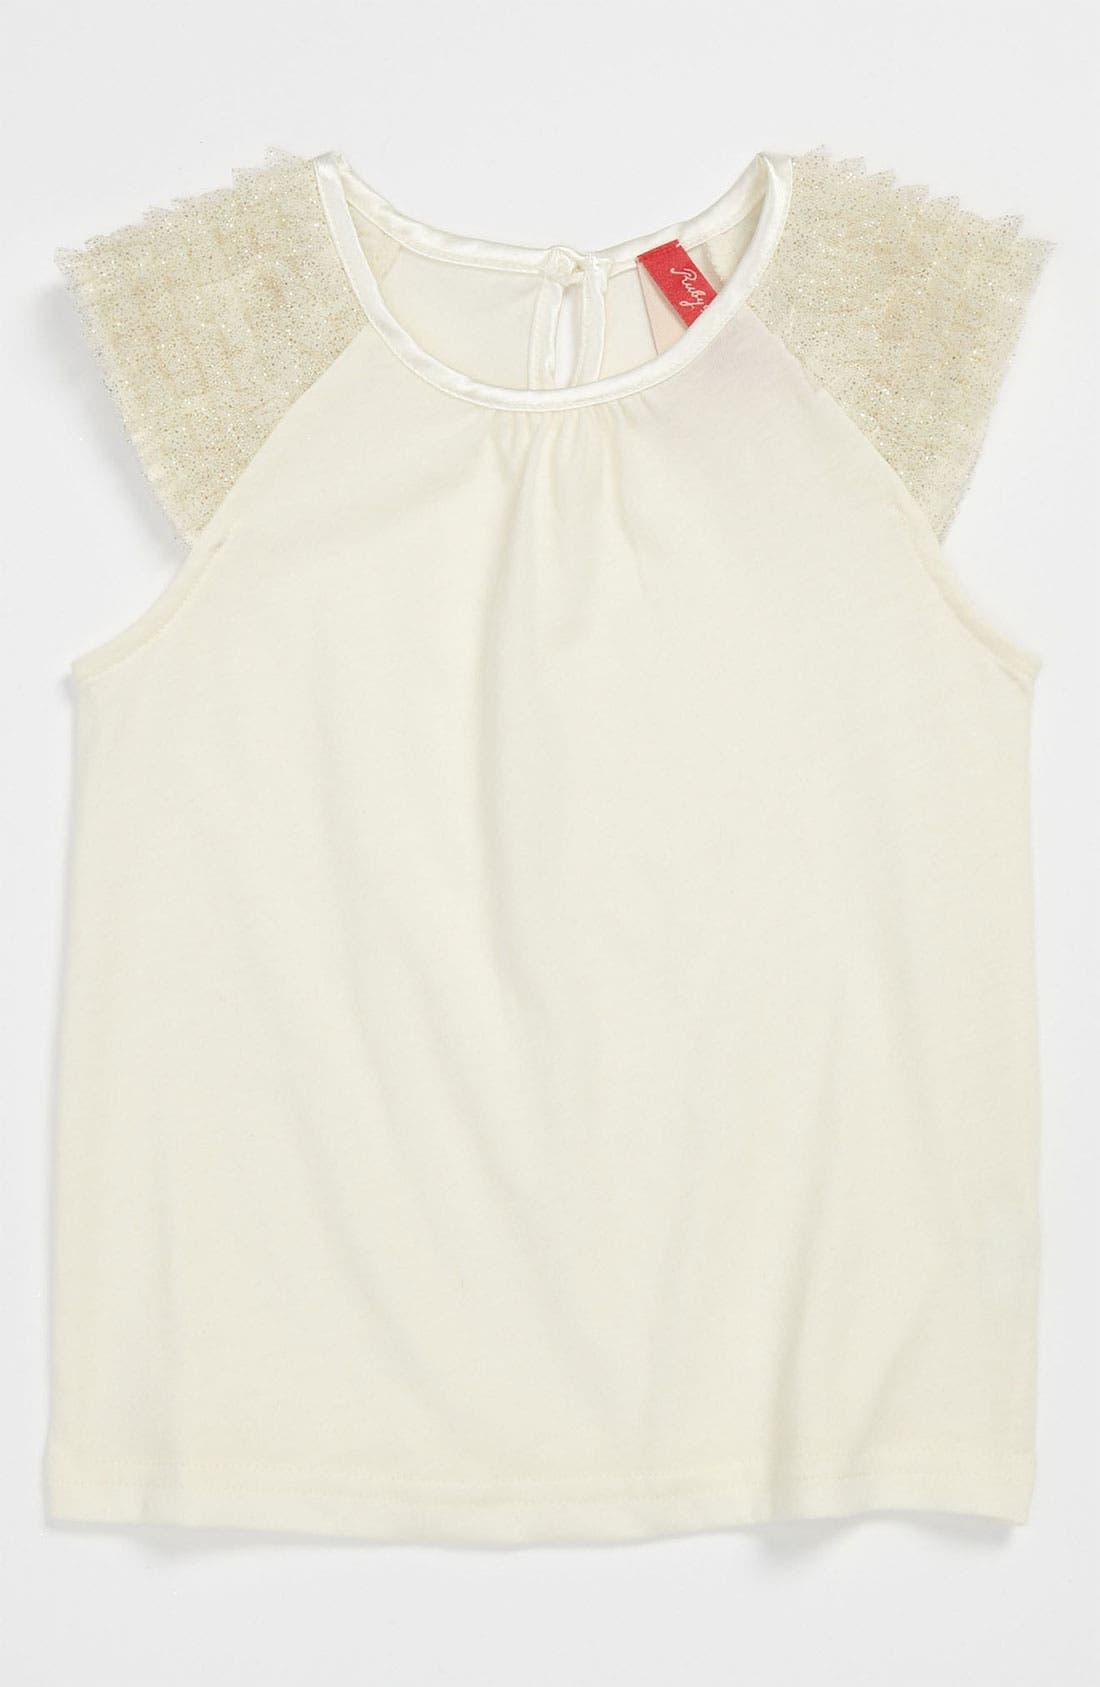 Alternate Image 1 Selected - Ruby & Bloom 'Mariah' Knit Top (Toddler)